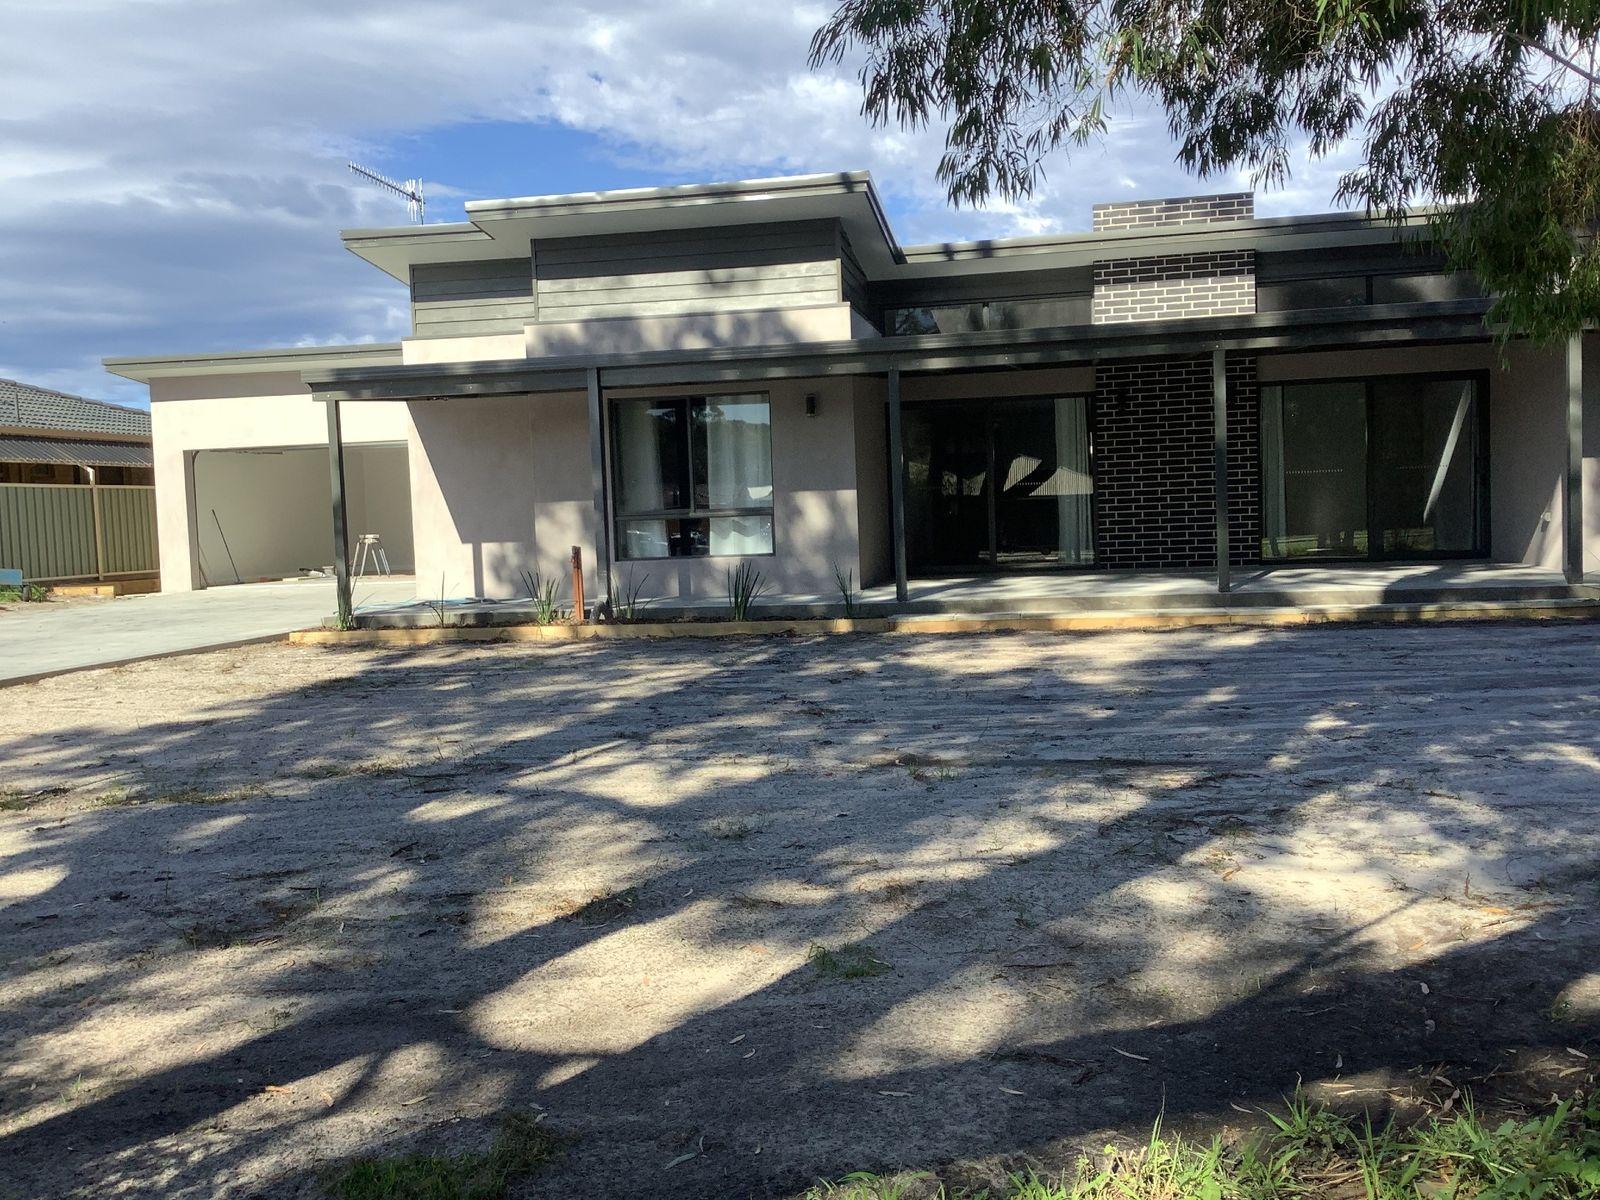 15 Grove Street West, Little Grove, WA 6330